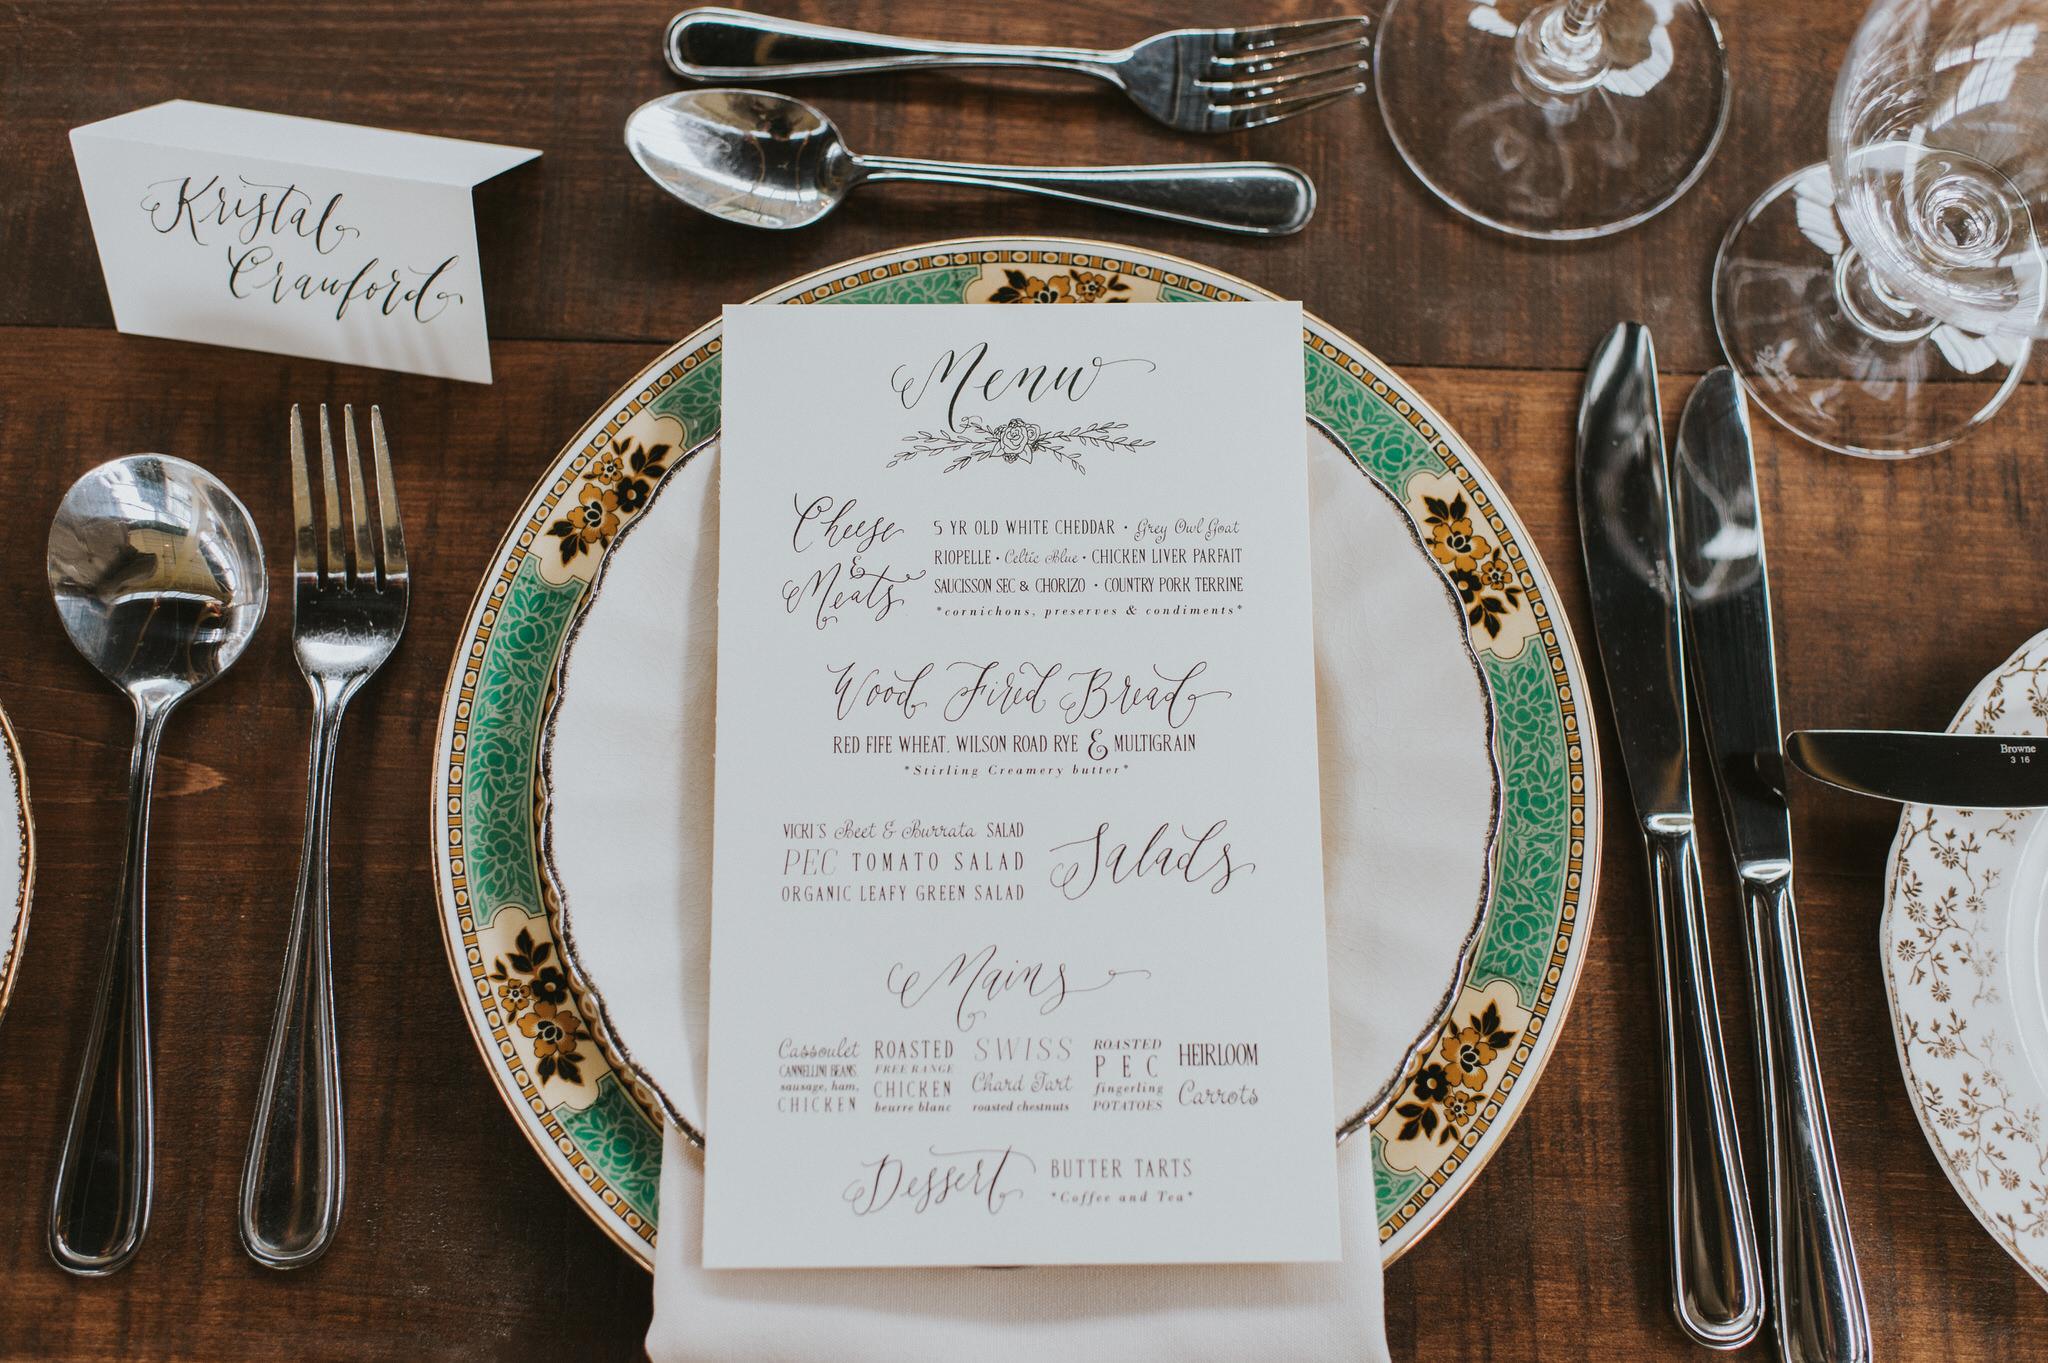 scarletoneillphotography_weddingphotography_prince edward county weddings086.JPG